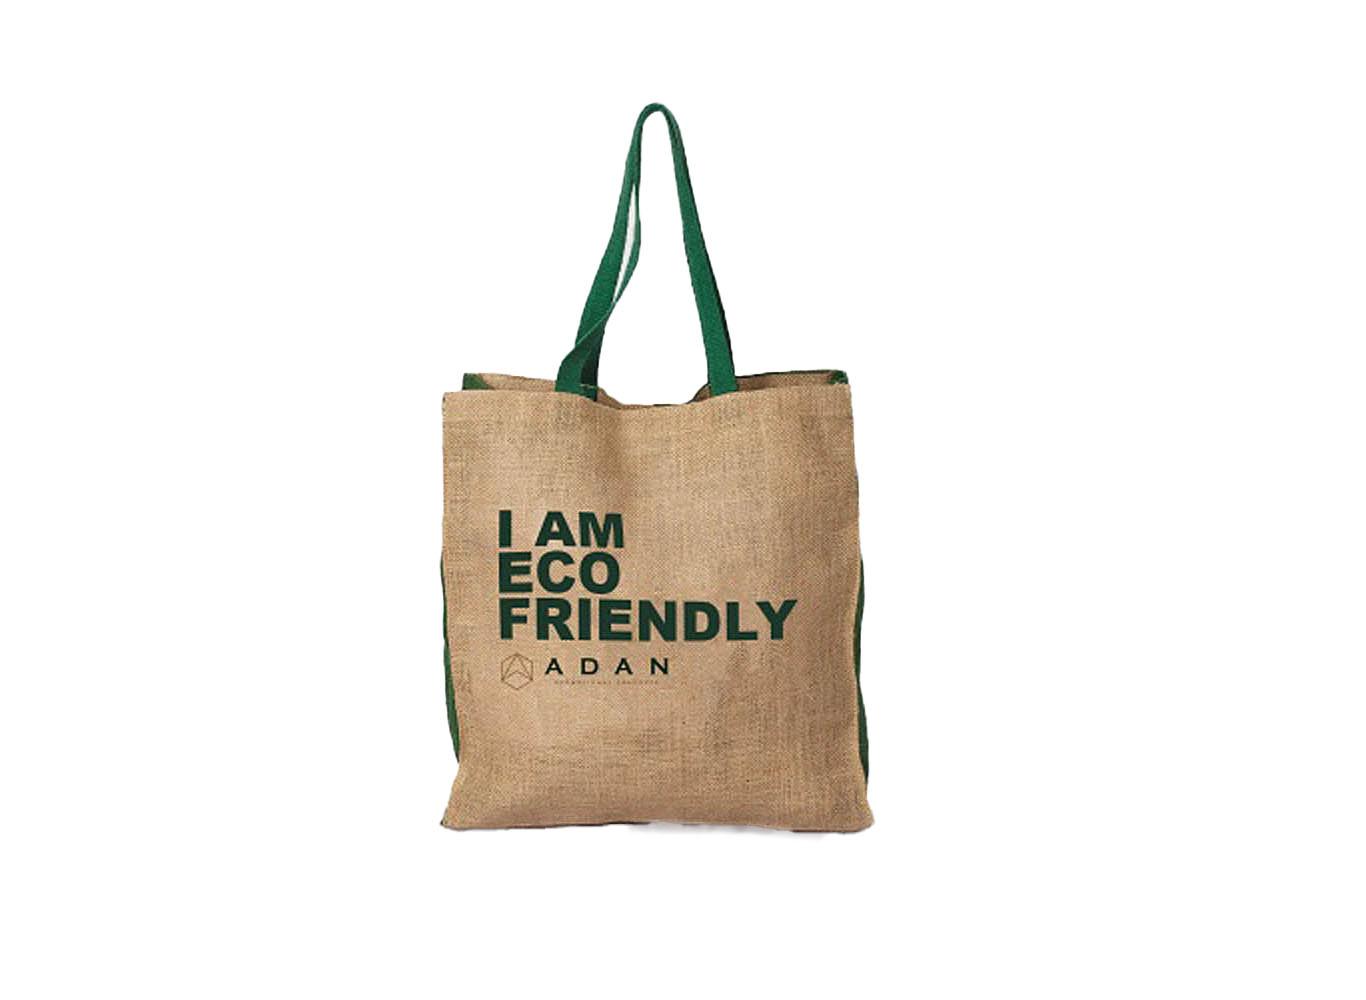 Custom Printed Jute Shopping Bag